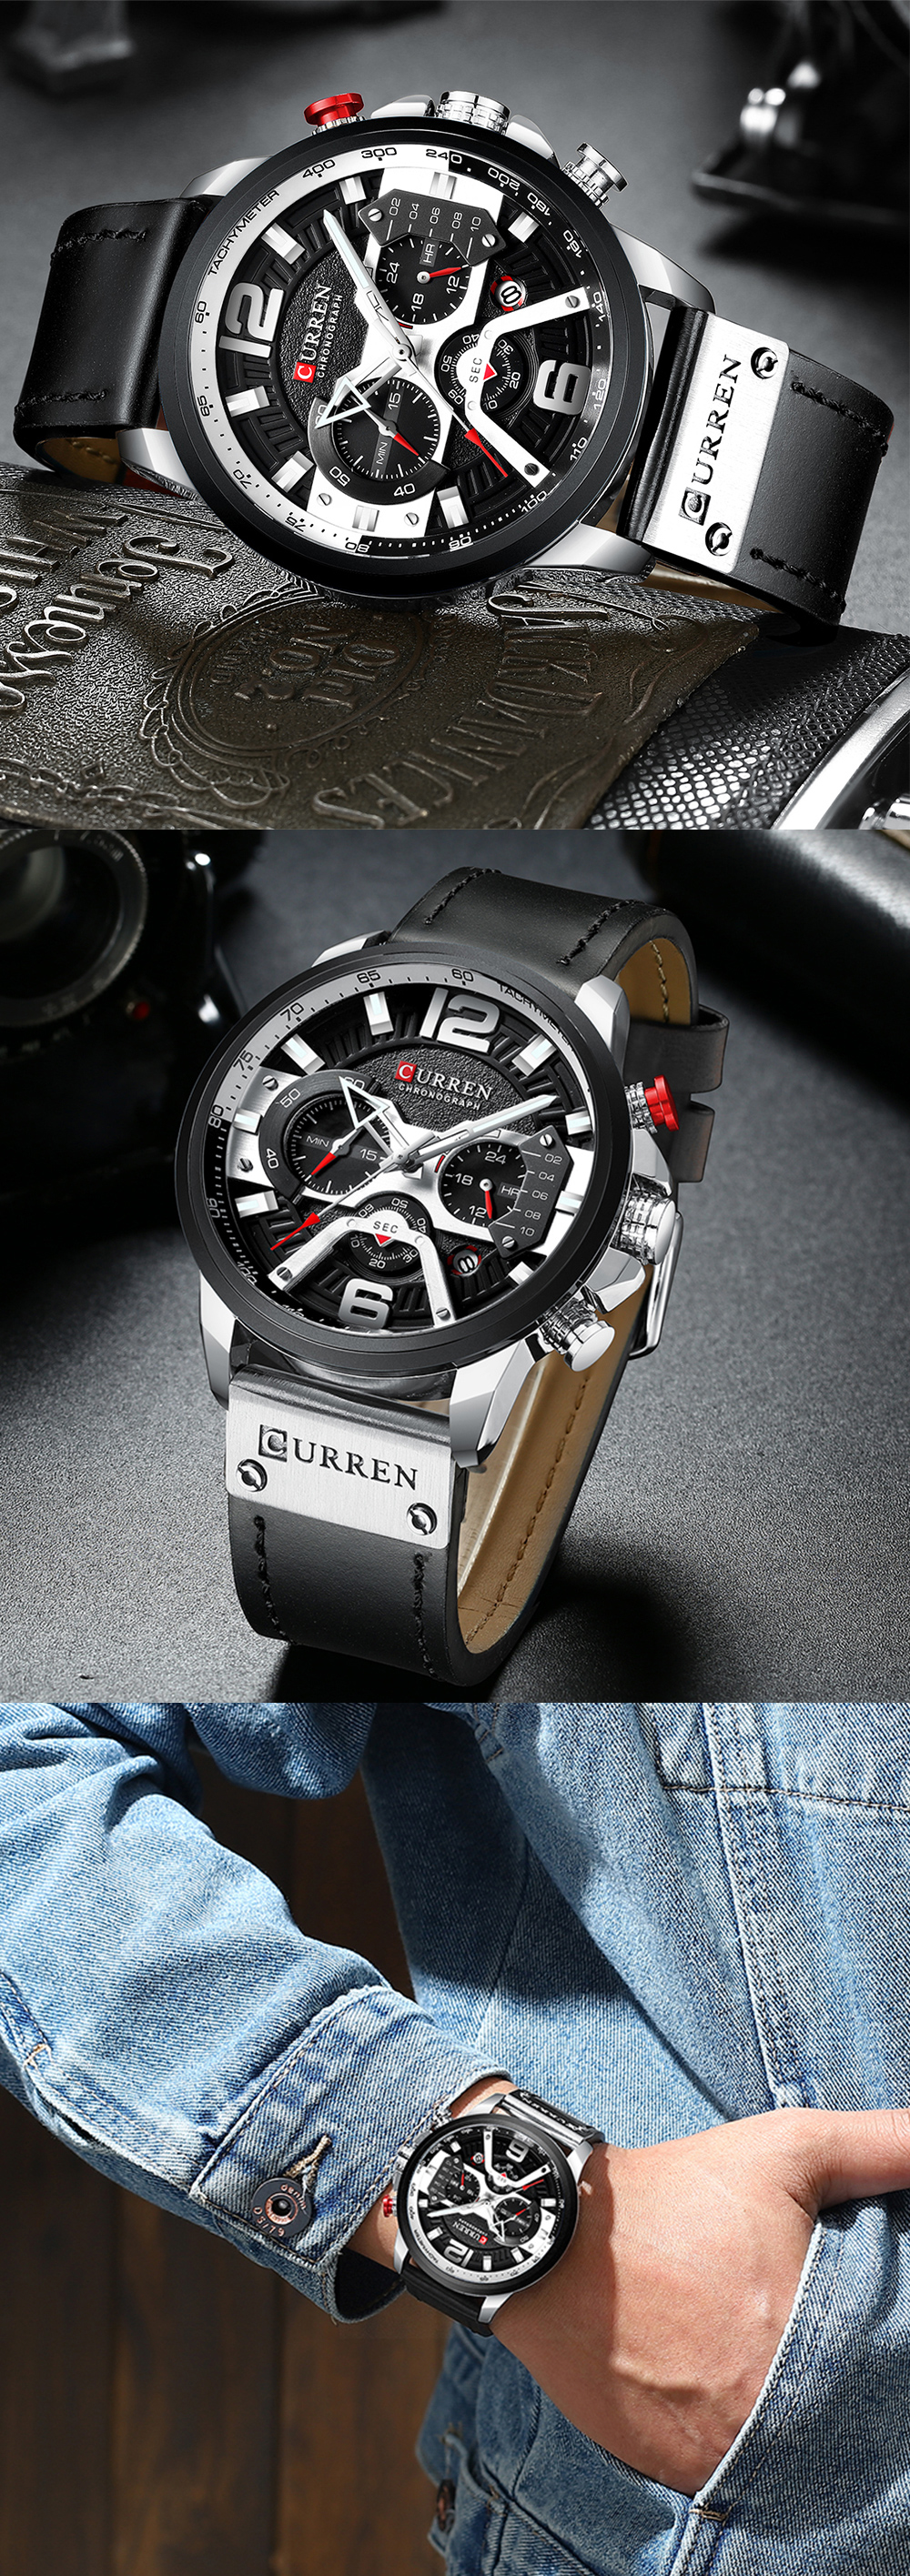 HTB16N0STY2pK1RjSZFsq6yNlXXaK Watches Men CURREN Brand Men Sport Watches Men's Quartz Clock Man Casual Military Waterproof Wrist Watch relogio masculino